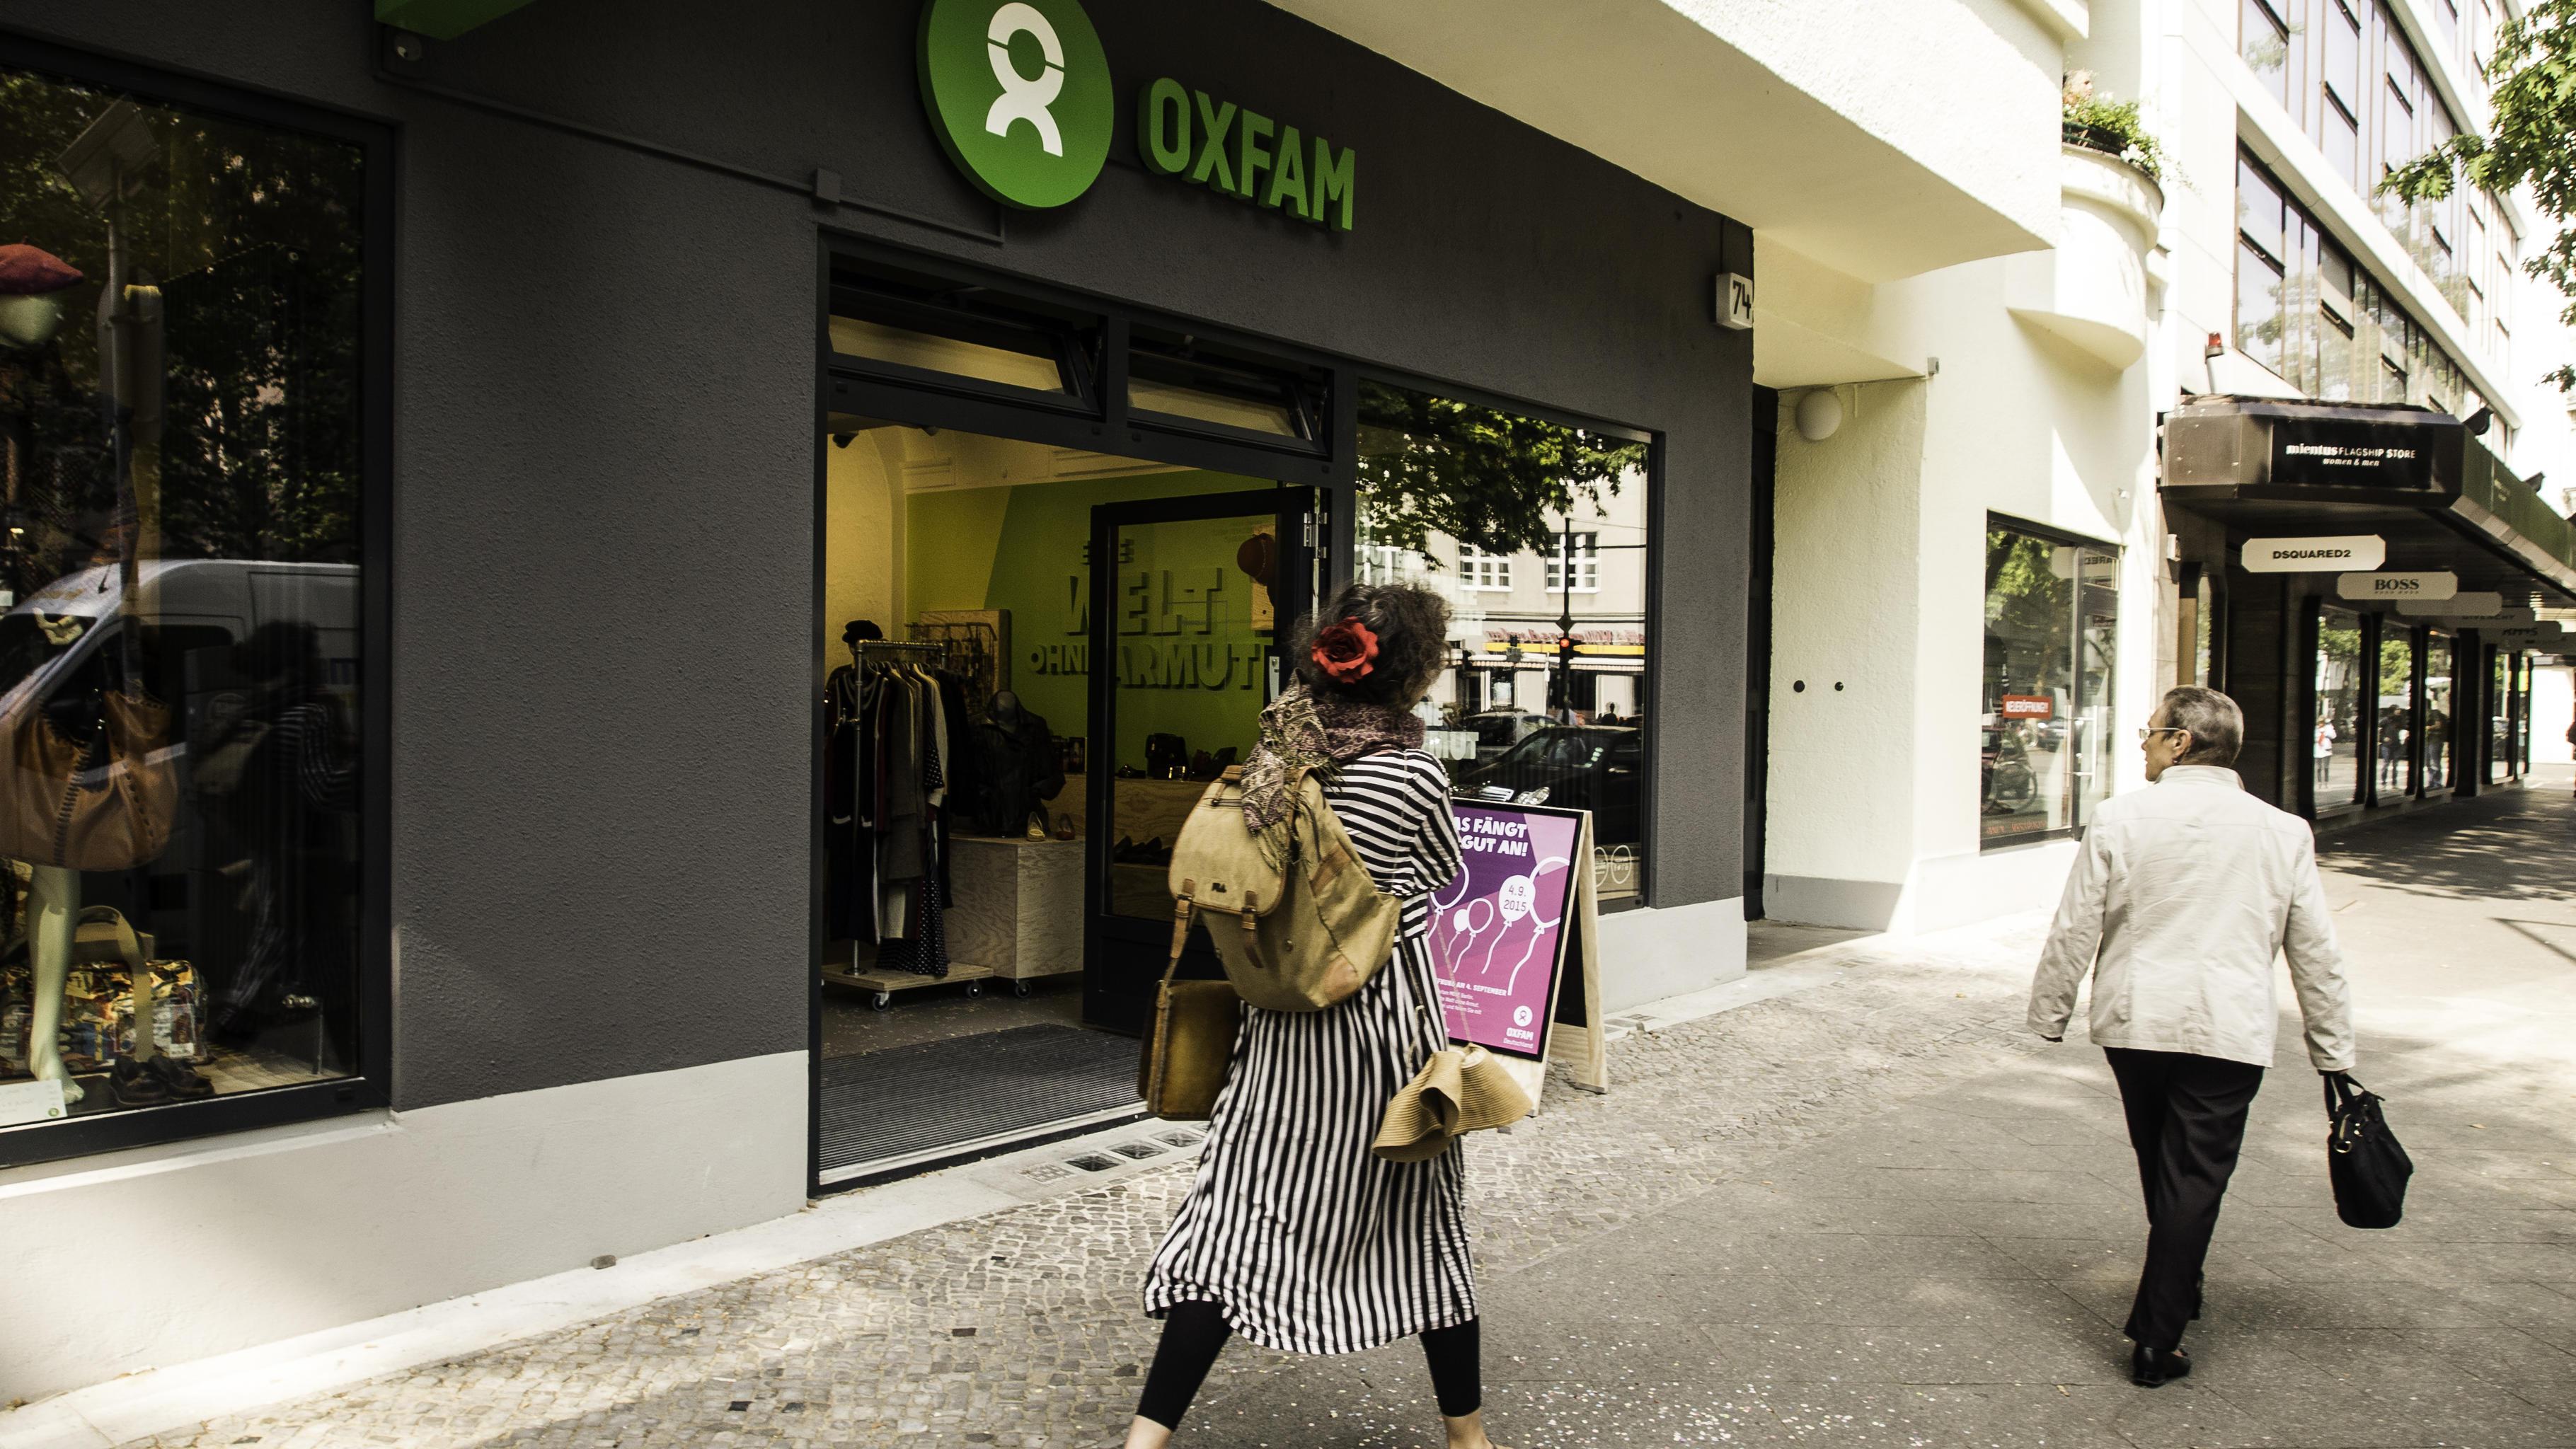 Die oxfam shops for Oxfam spenden